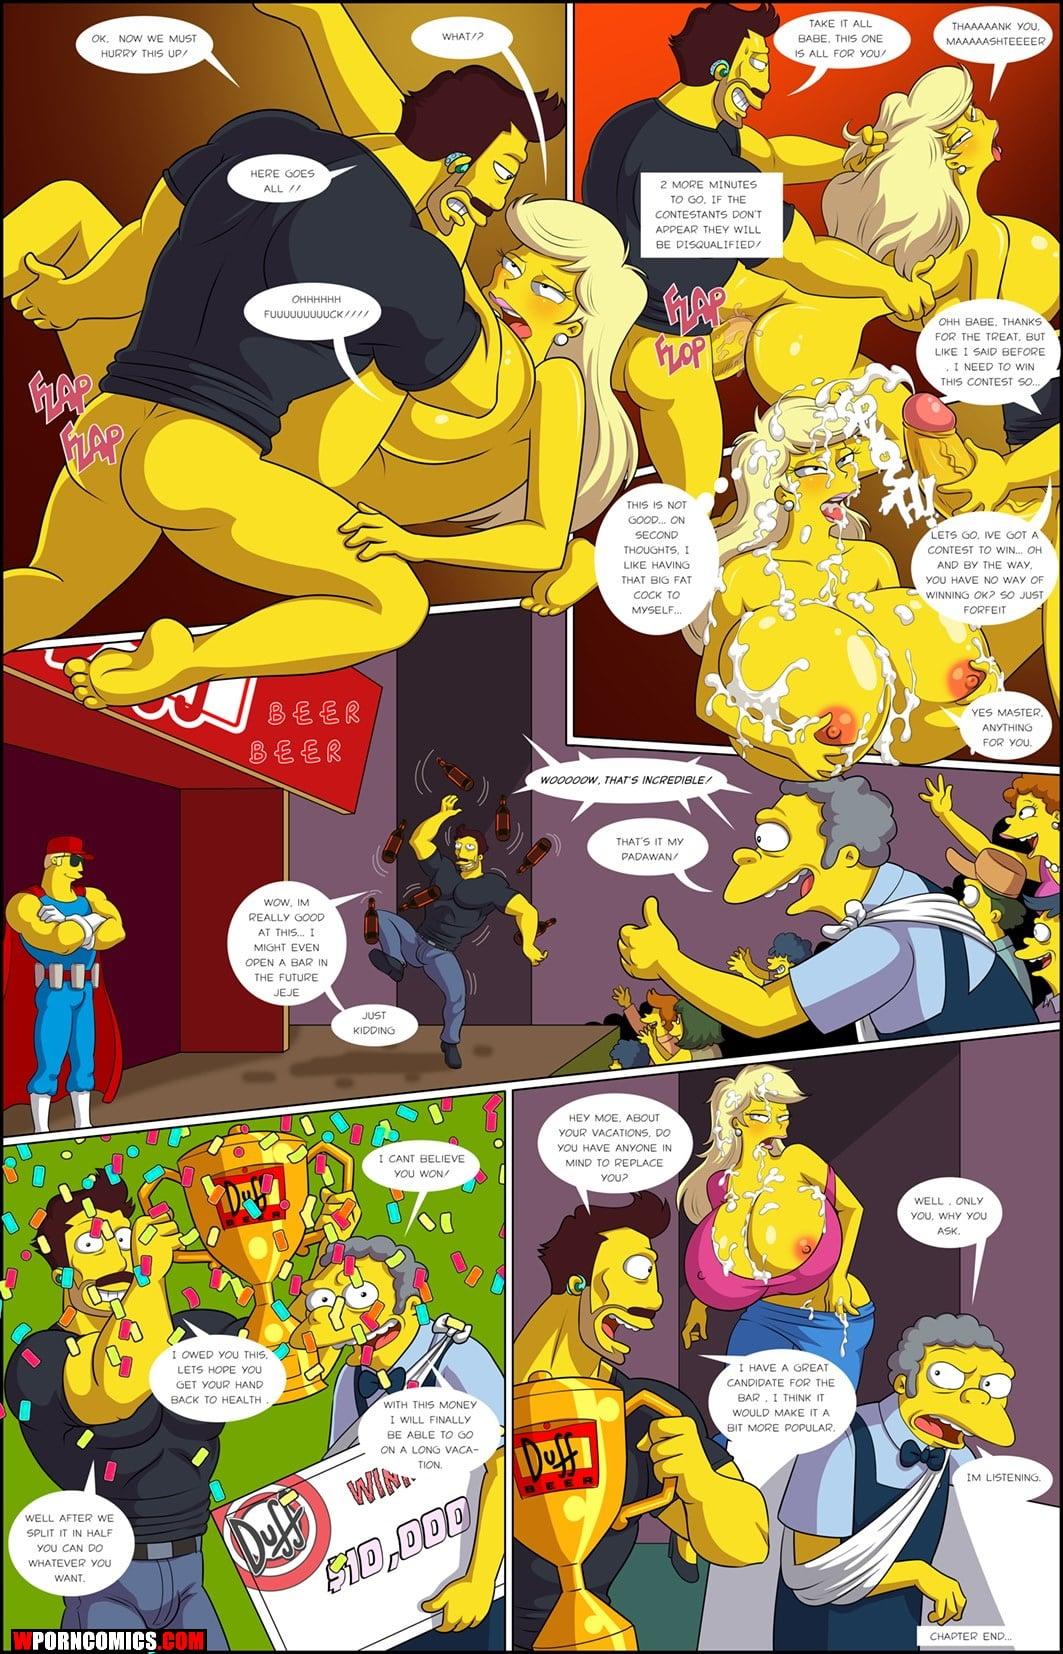 porn-comic-simpsons-darrens-adventure-part-2-2020-03-21/porn-comic-simpsons-darrens-adventure-part-2-2020-03-21-35445.jpg